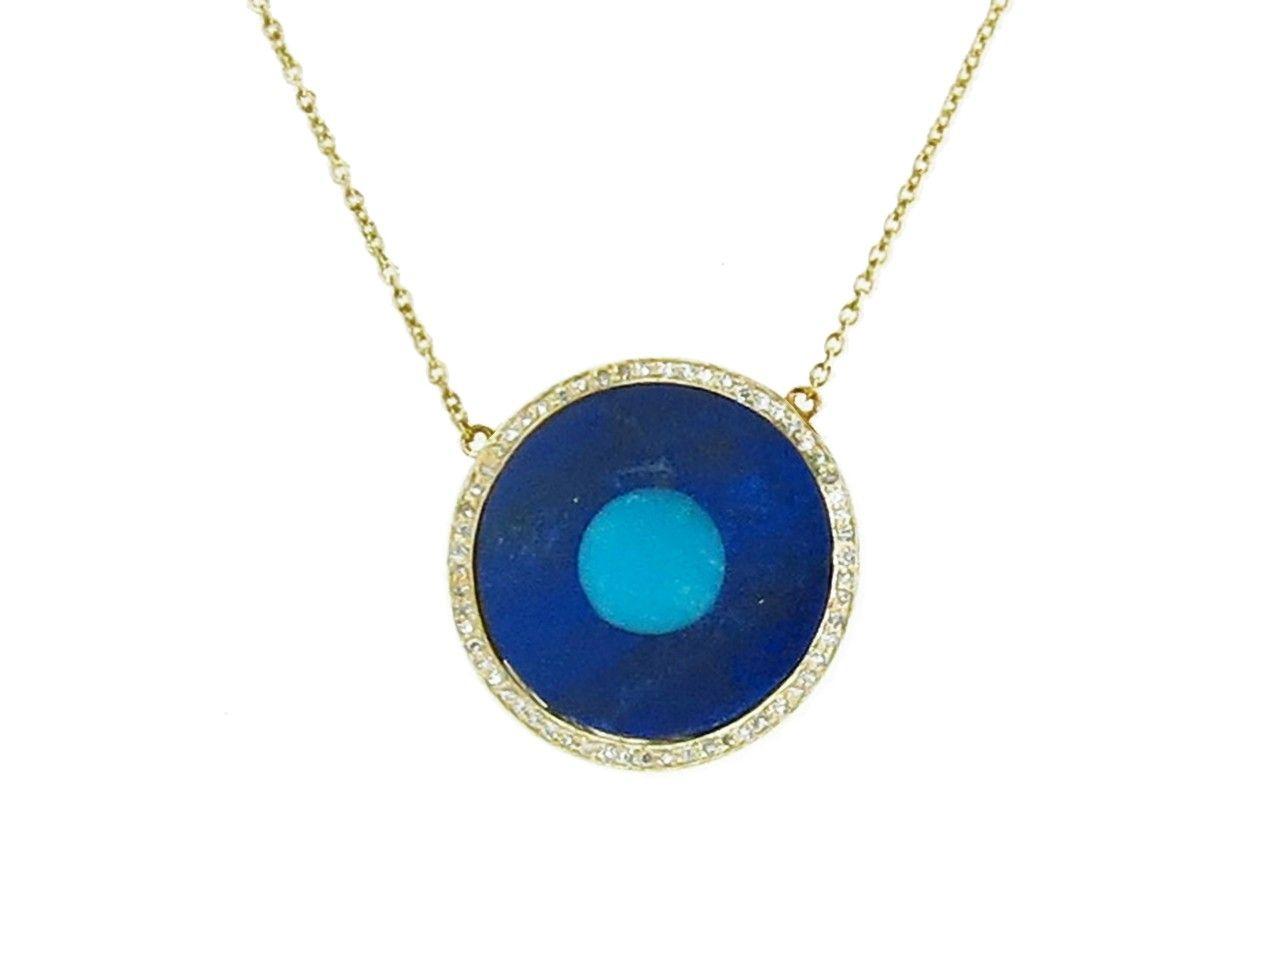 db8810b0c84ec Jennifer Meyer - Jennifer Meyer Jewelry - Jennifer Meyer Jewelry ...